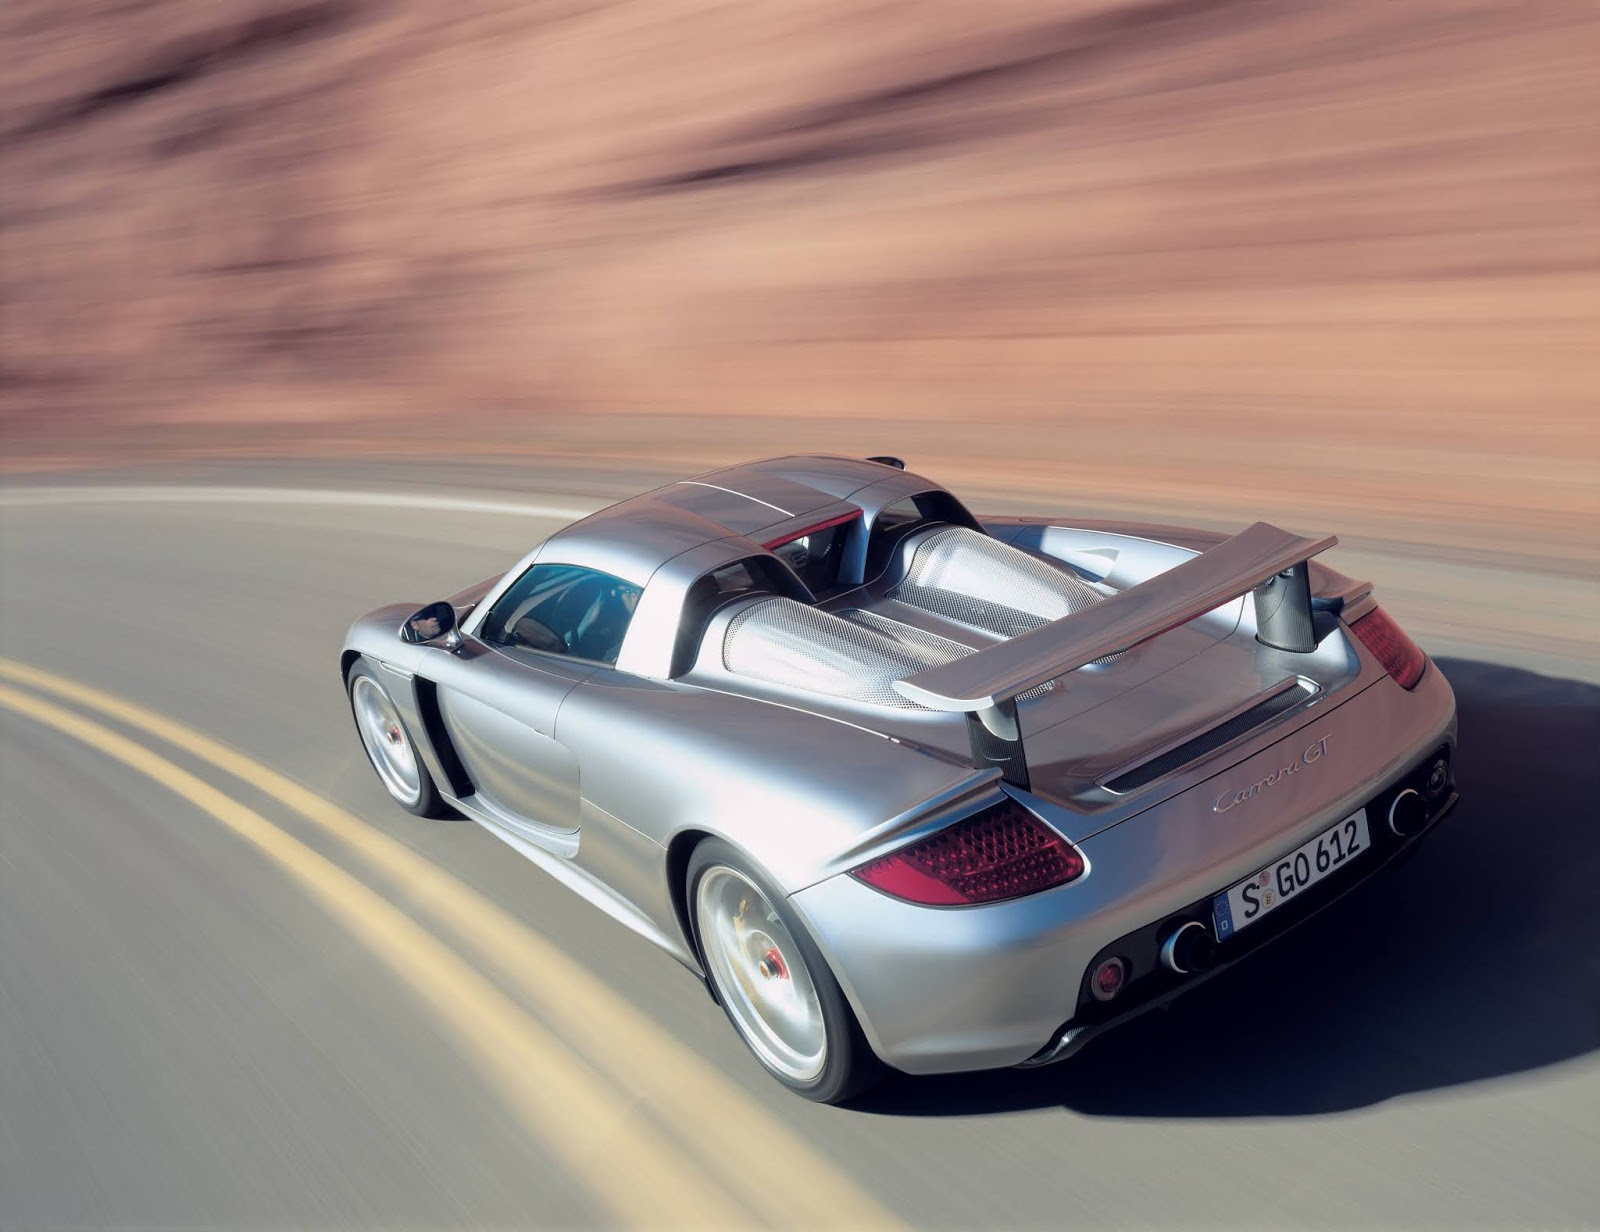 P03 0532 a4 Porsche Carrera GT : Ένα αγωνιστικό LeMans, για το δρόμο Carrera GT, Porsche, Porsche Carrera GT, retrocar, retrocar sunday, supercar, zblog